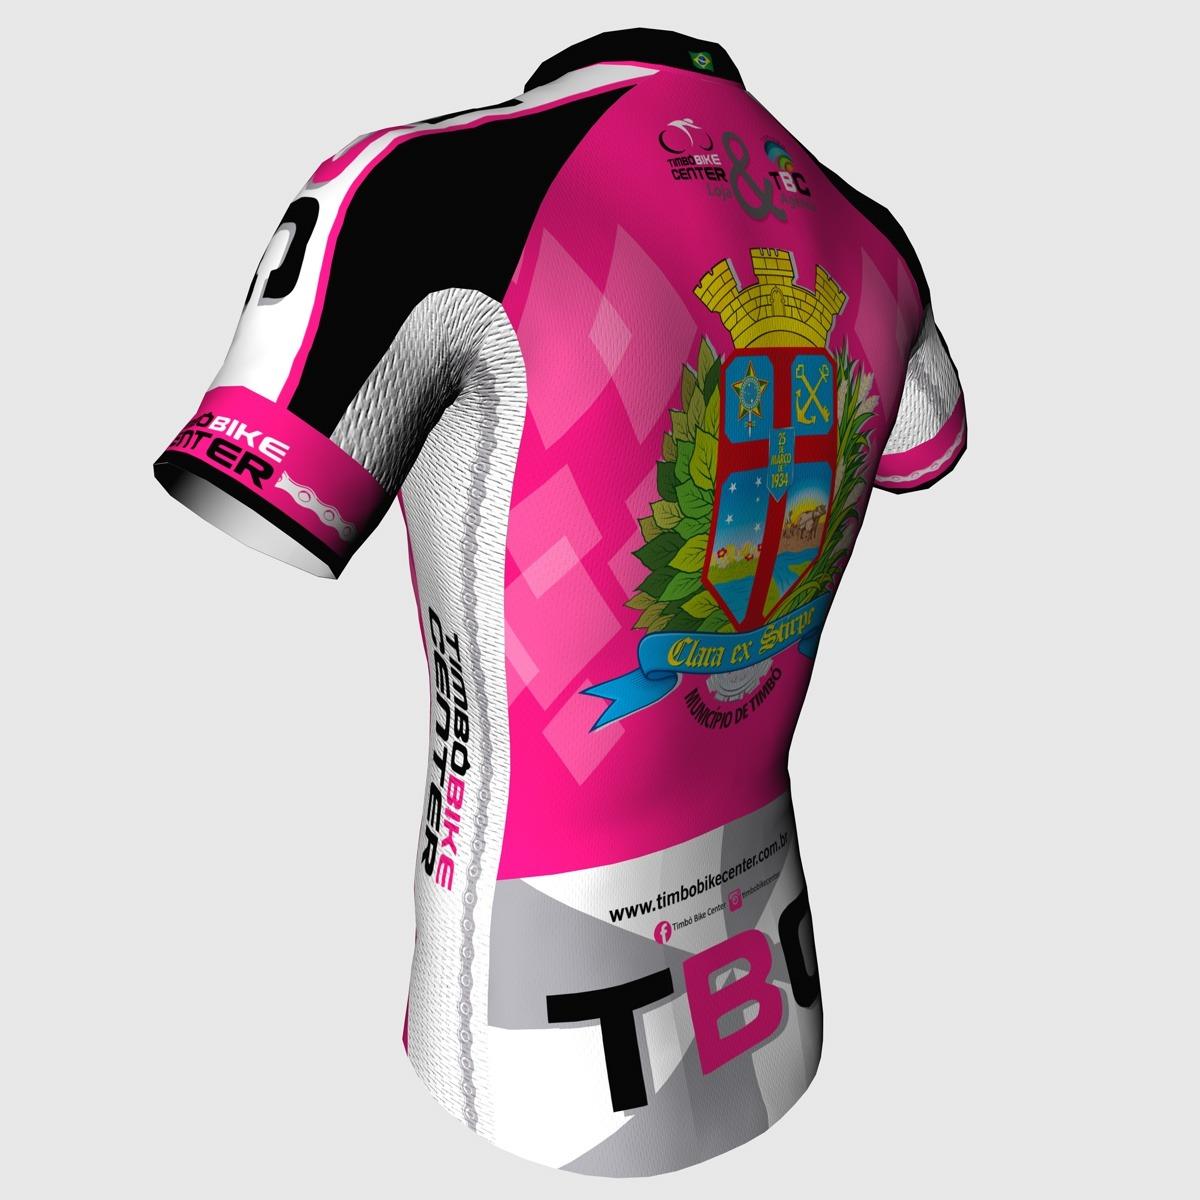 Camisa de Ciclismo Slim Manga Curta TBC Timbó Bike Center Feminino